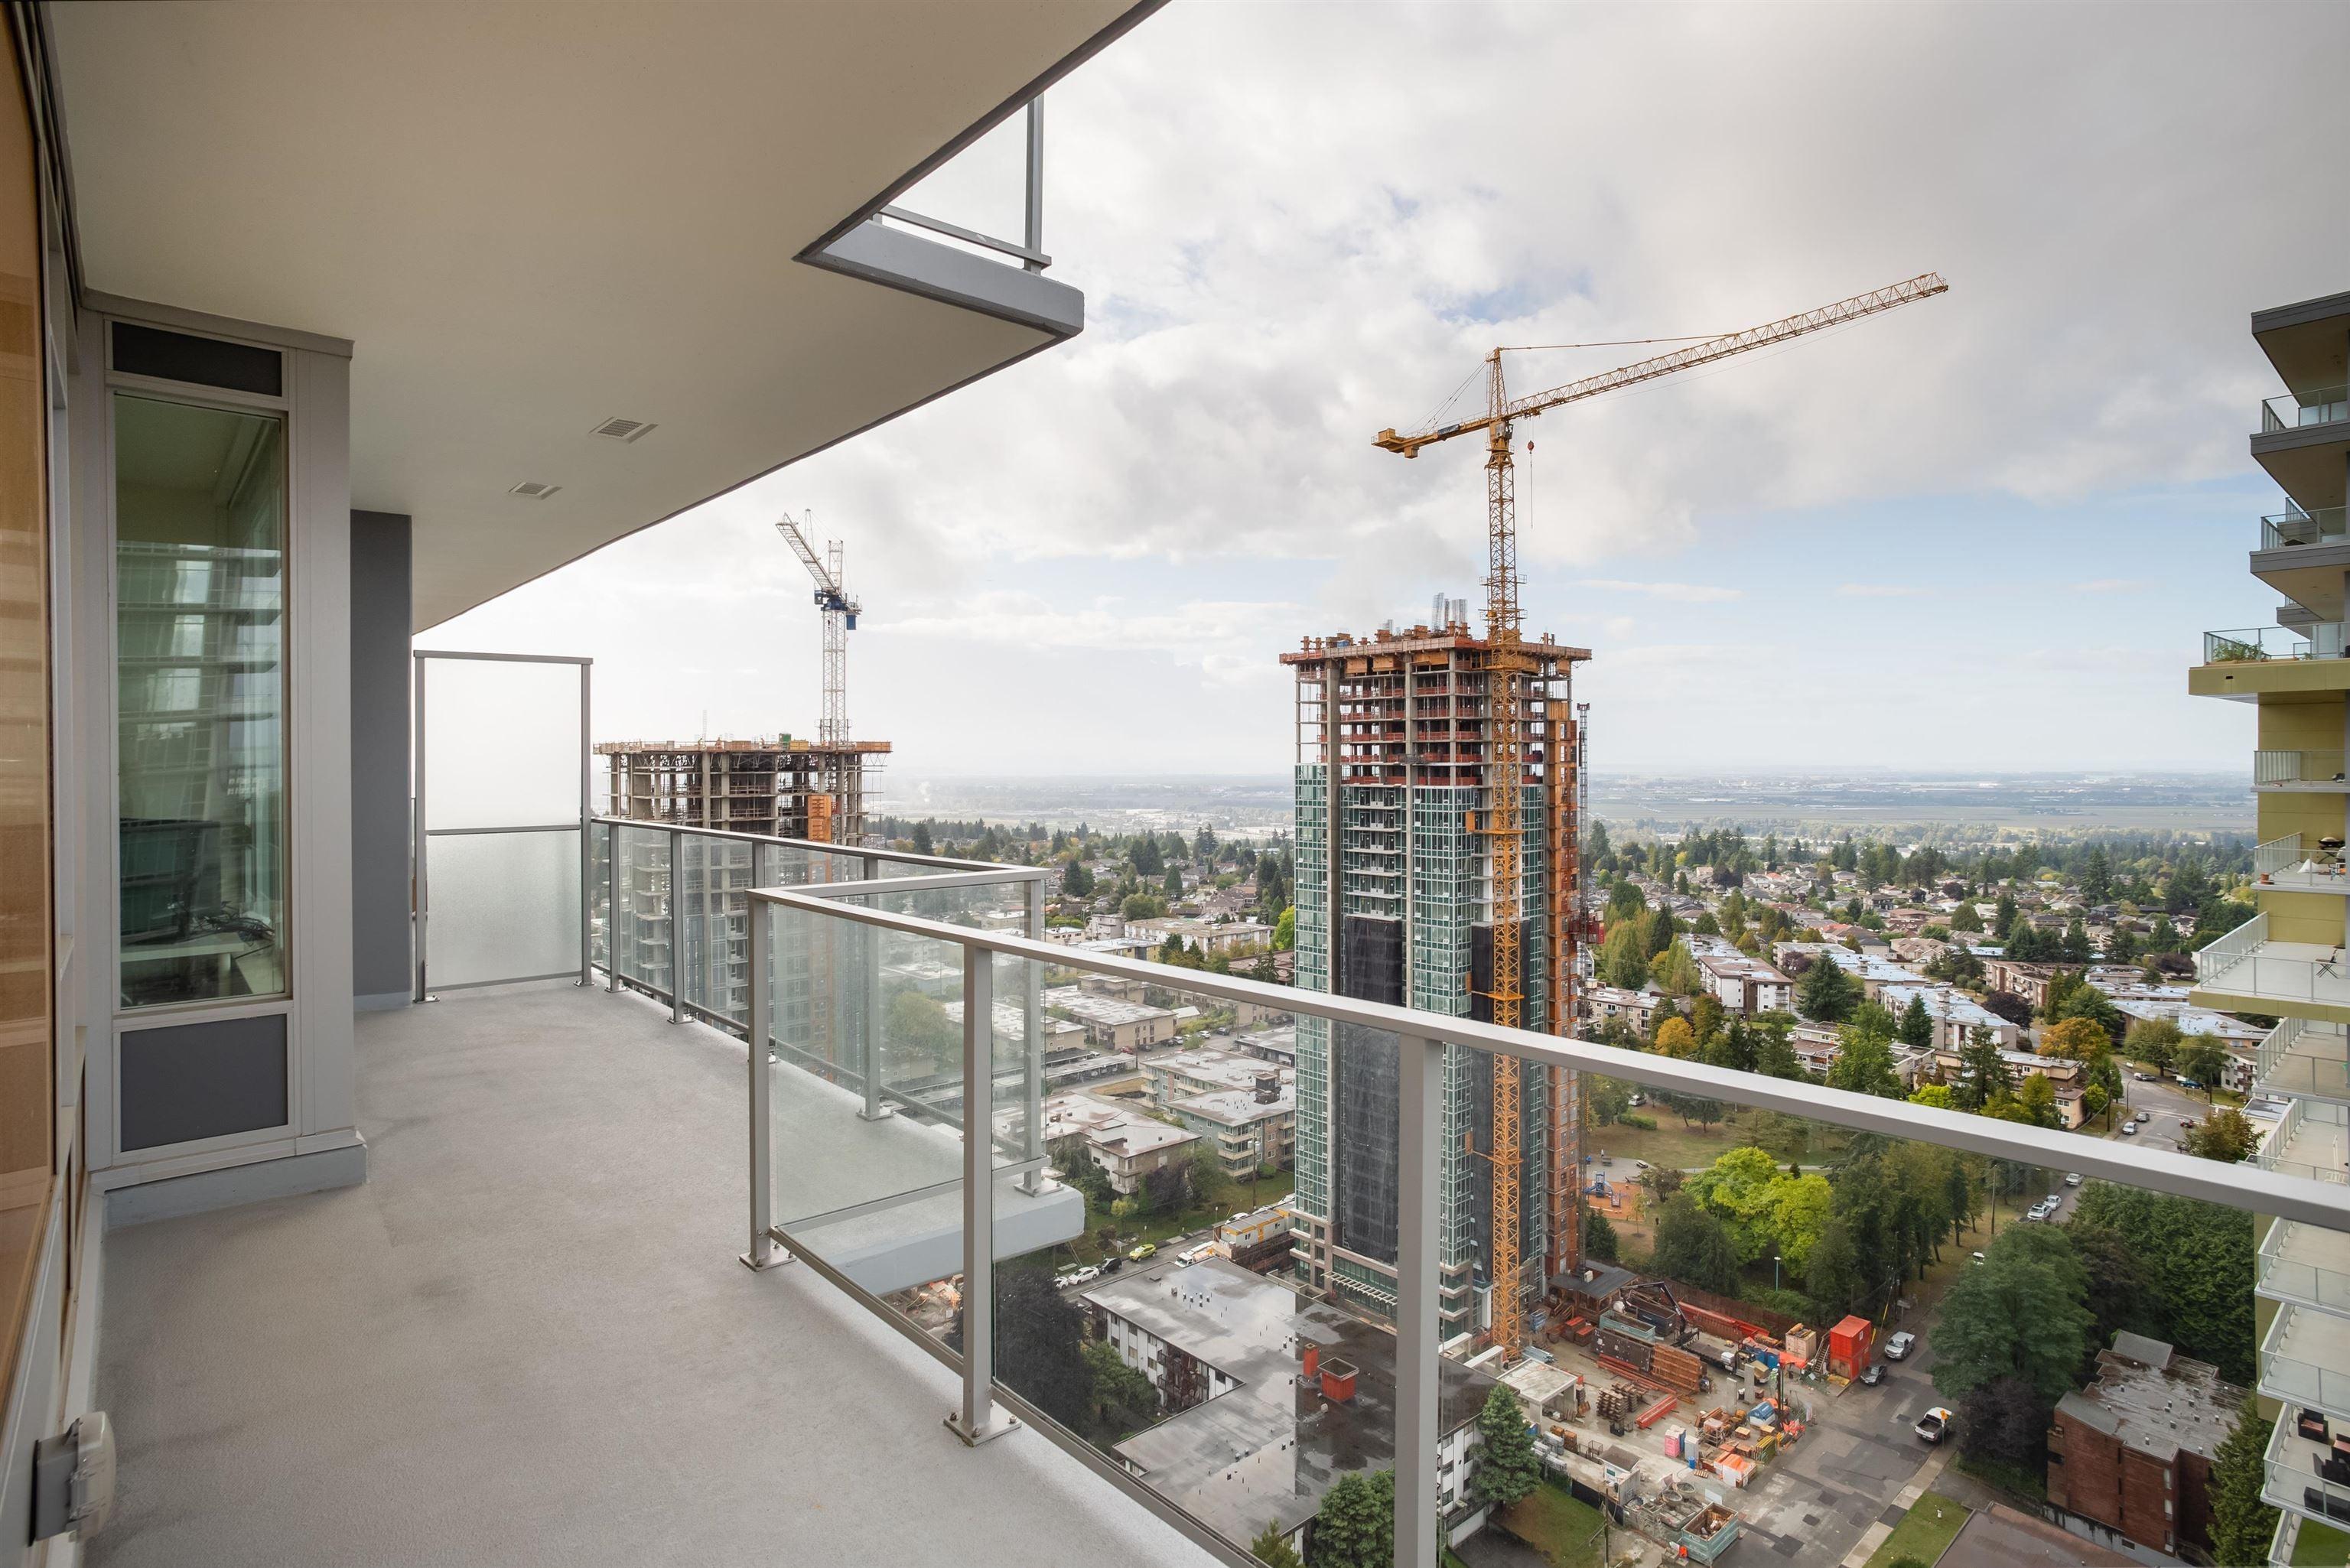 2206 6383 MCKAY AVENUE - Metrotown Apartment/Condo for sale, 2 Bedrooms (R2625647) - #31